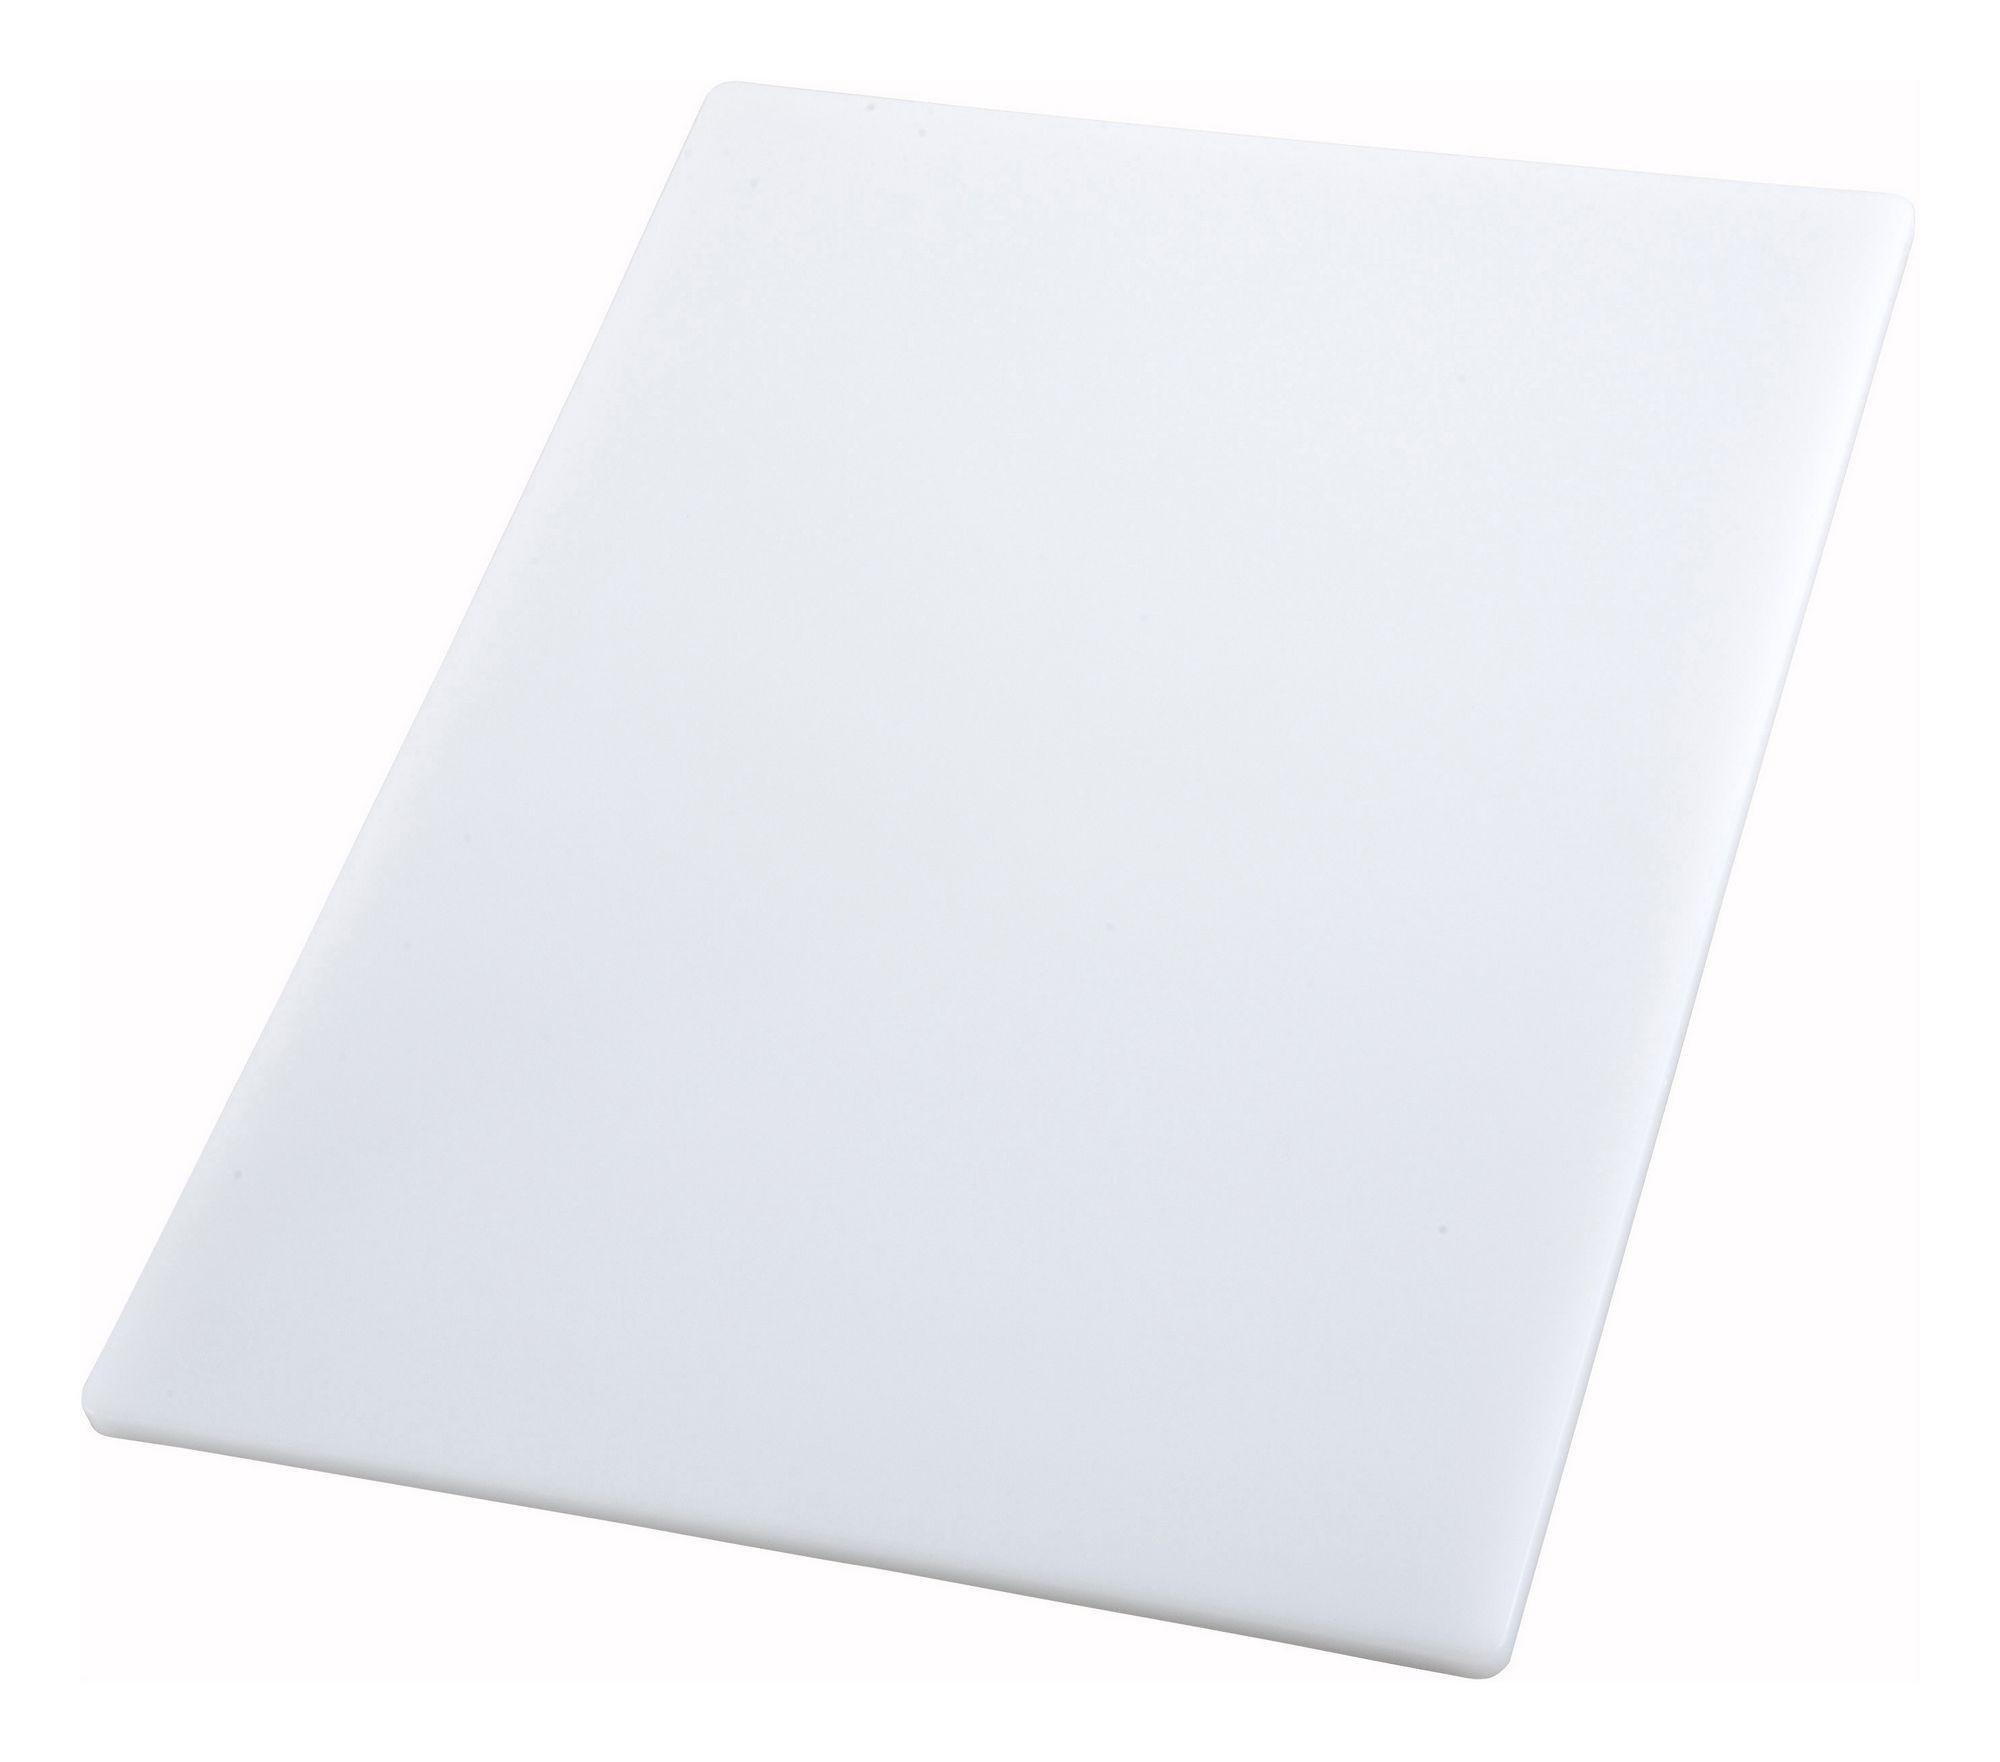 Thick White NSF Cutting Board - 18 X 30 X 1/2